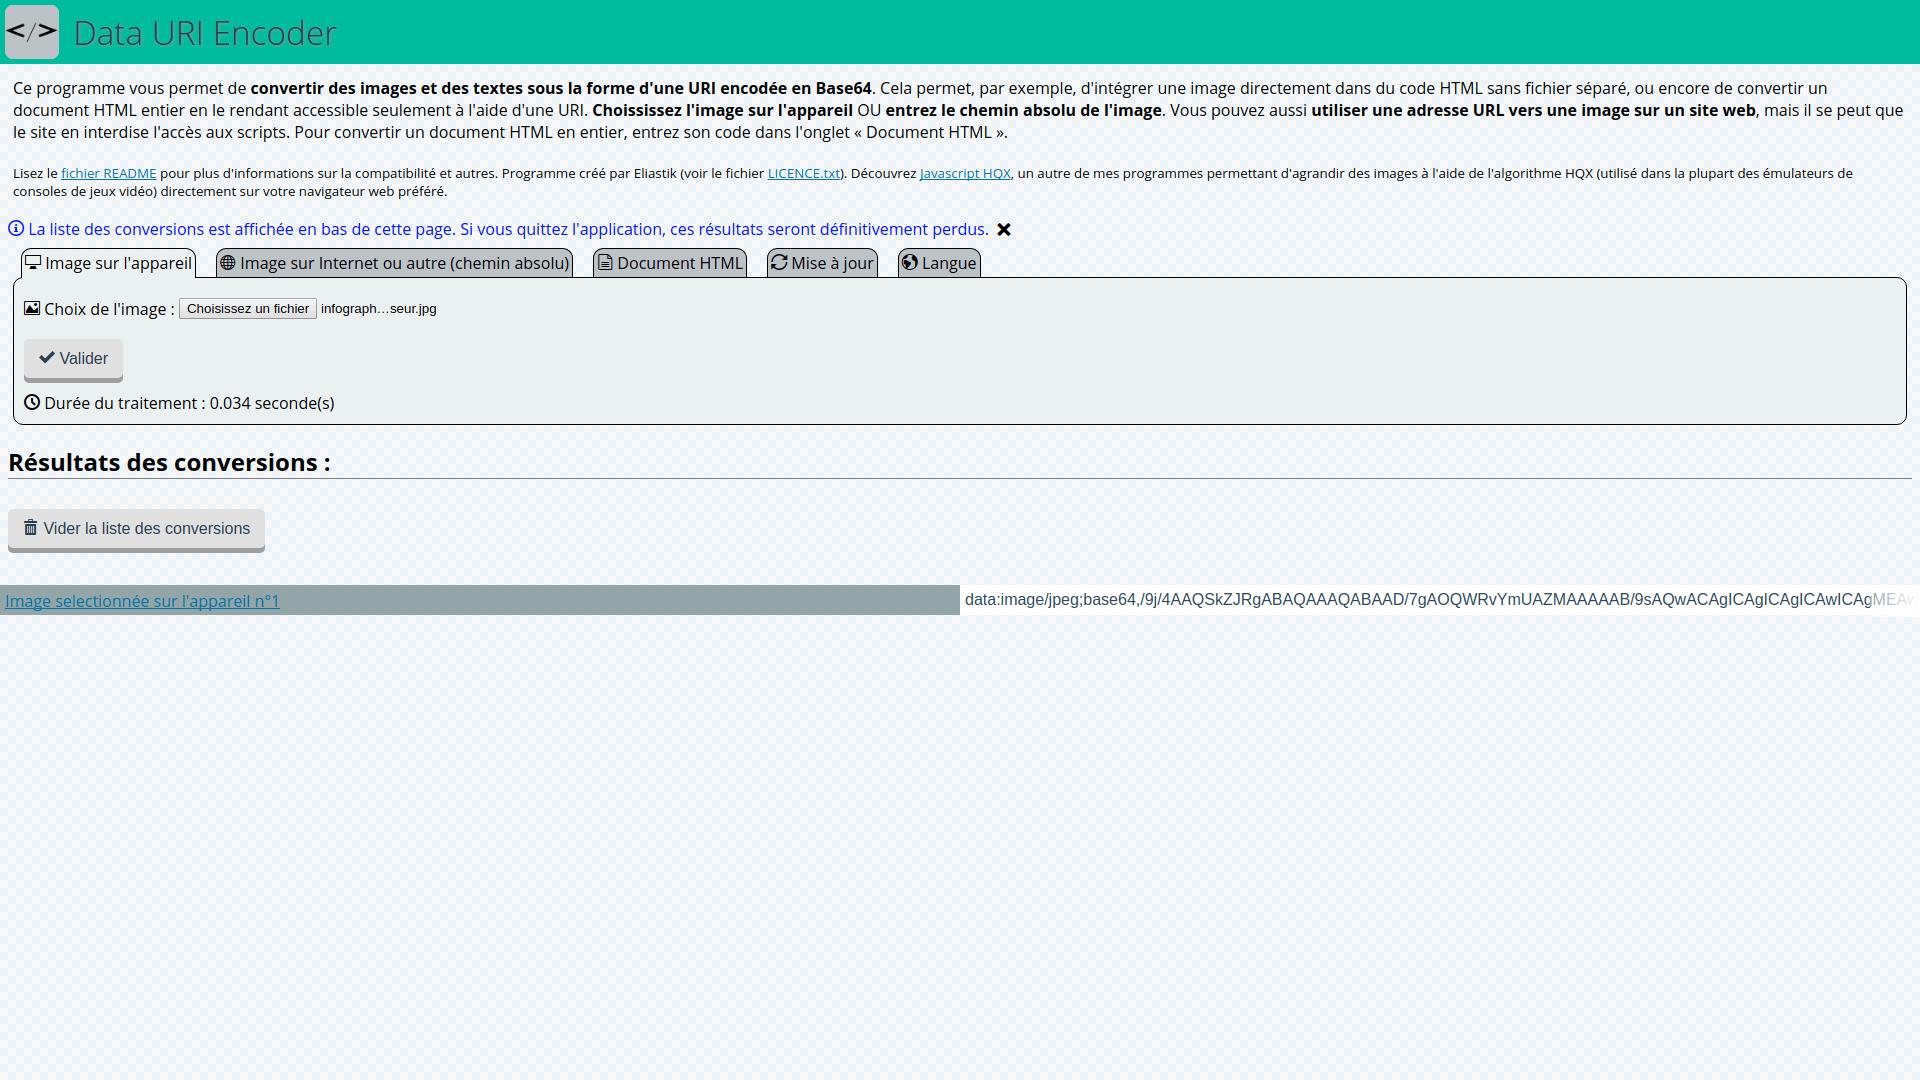 Data URI Encoder - Eliastik's Softs